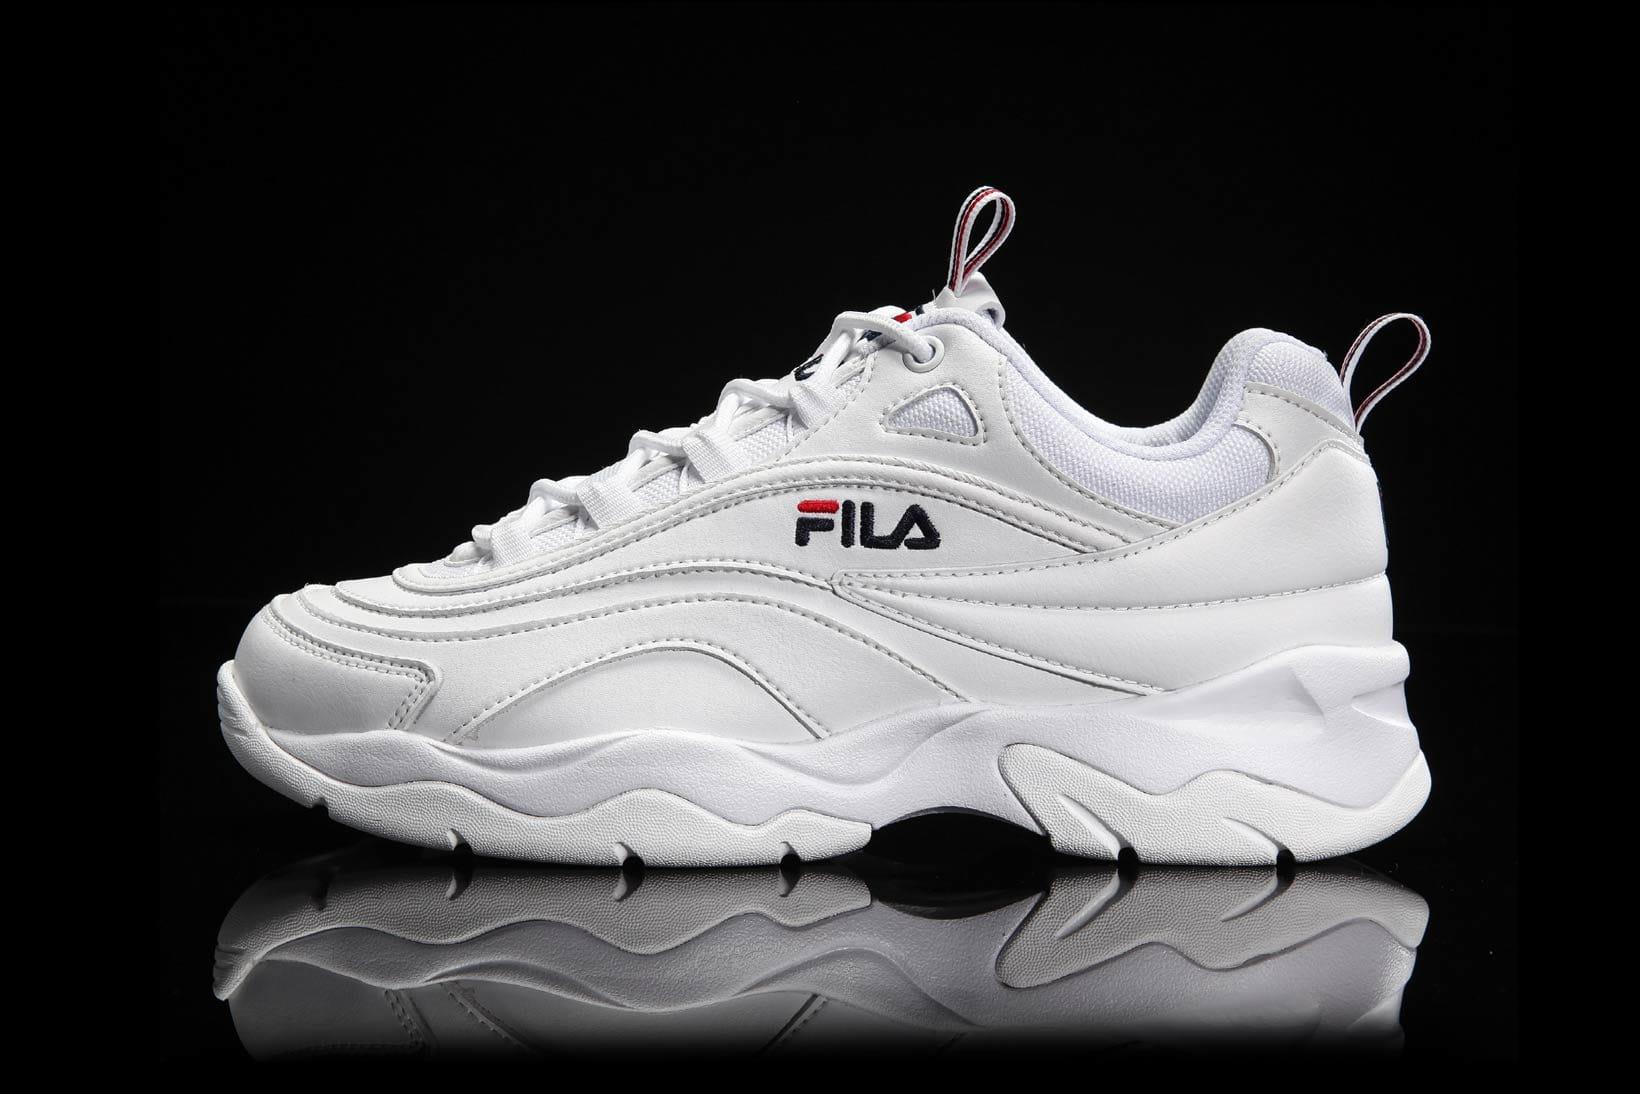 Chunky Dad Shoe, the FILA Ray